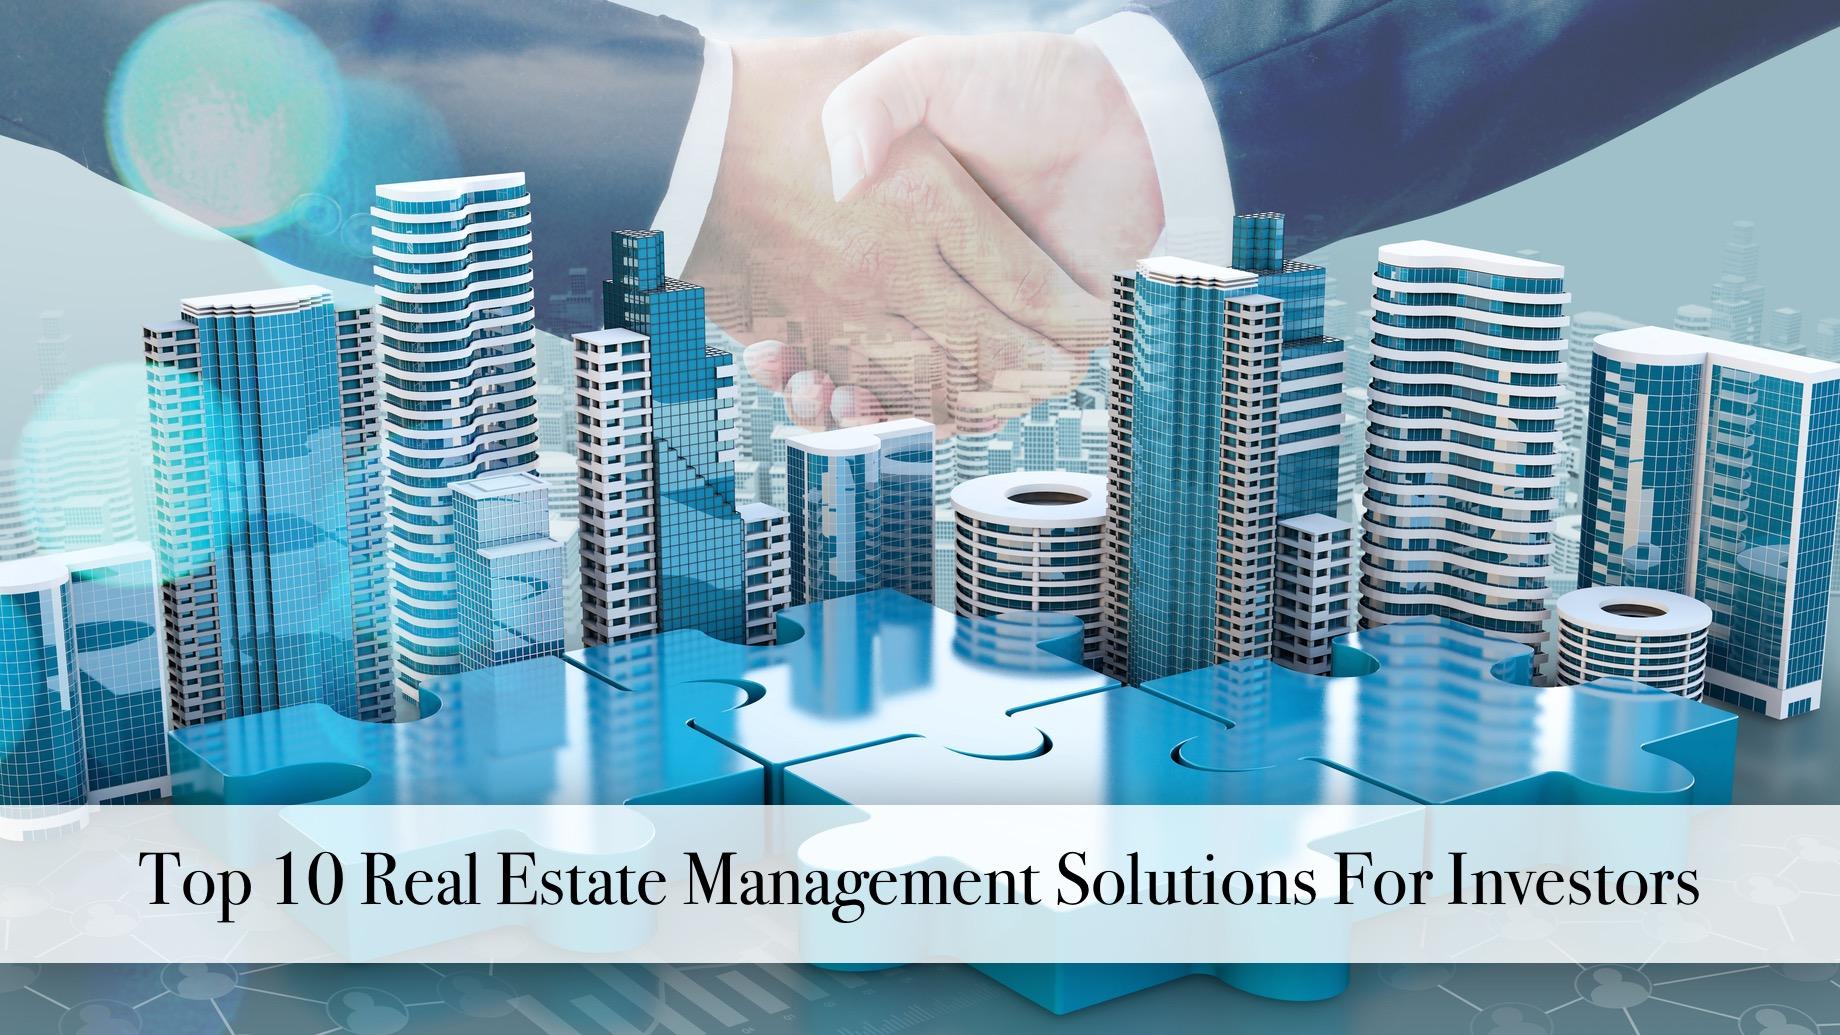 Top 10 Real Estate Management Solutions For Investors